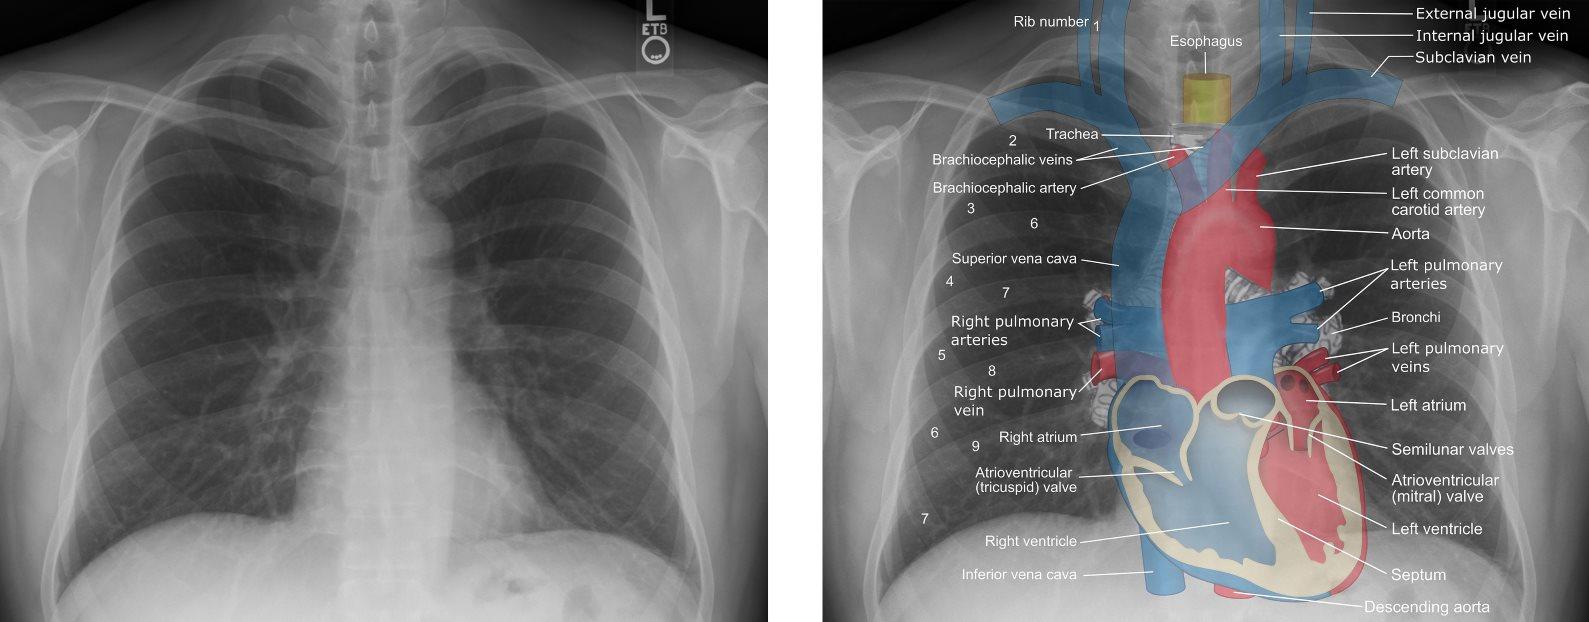 Chest Xray Anatomy Labeled Br Clinical Radiology Anatomy Cxr